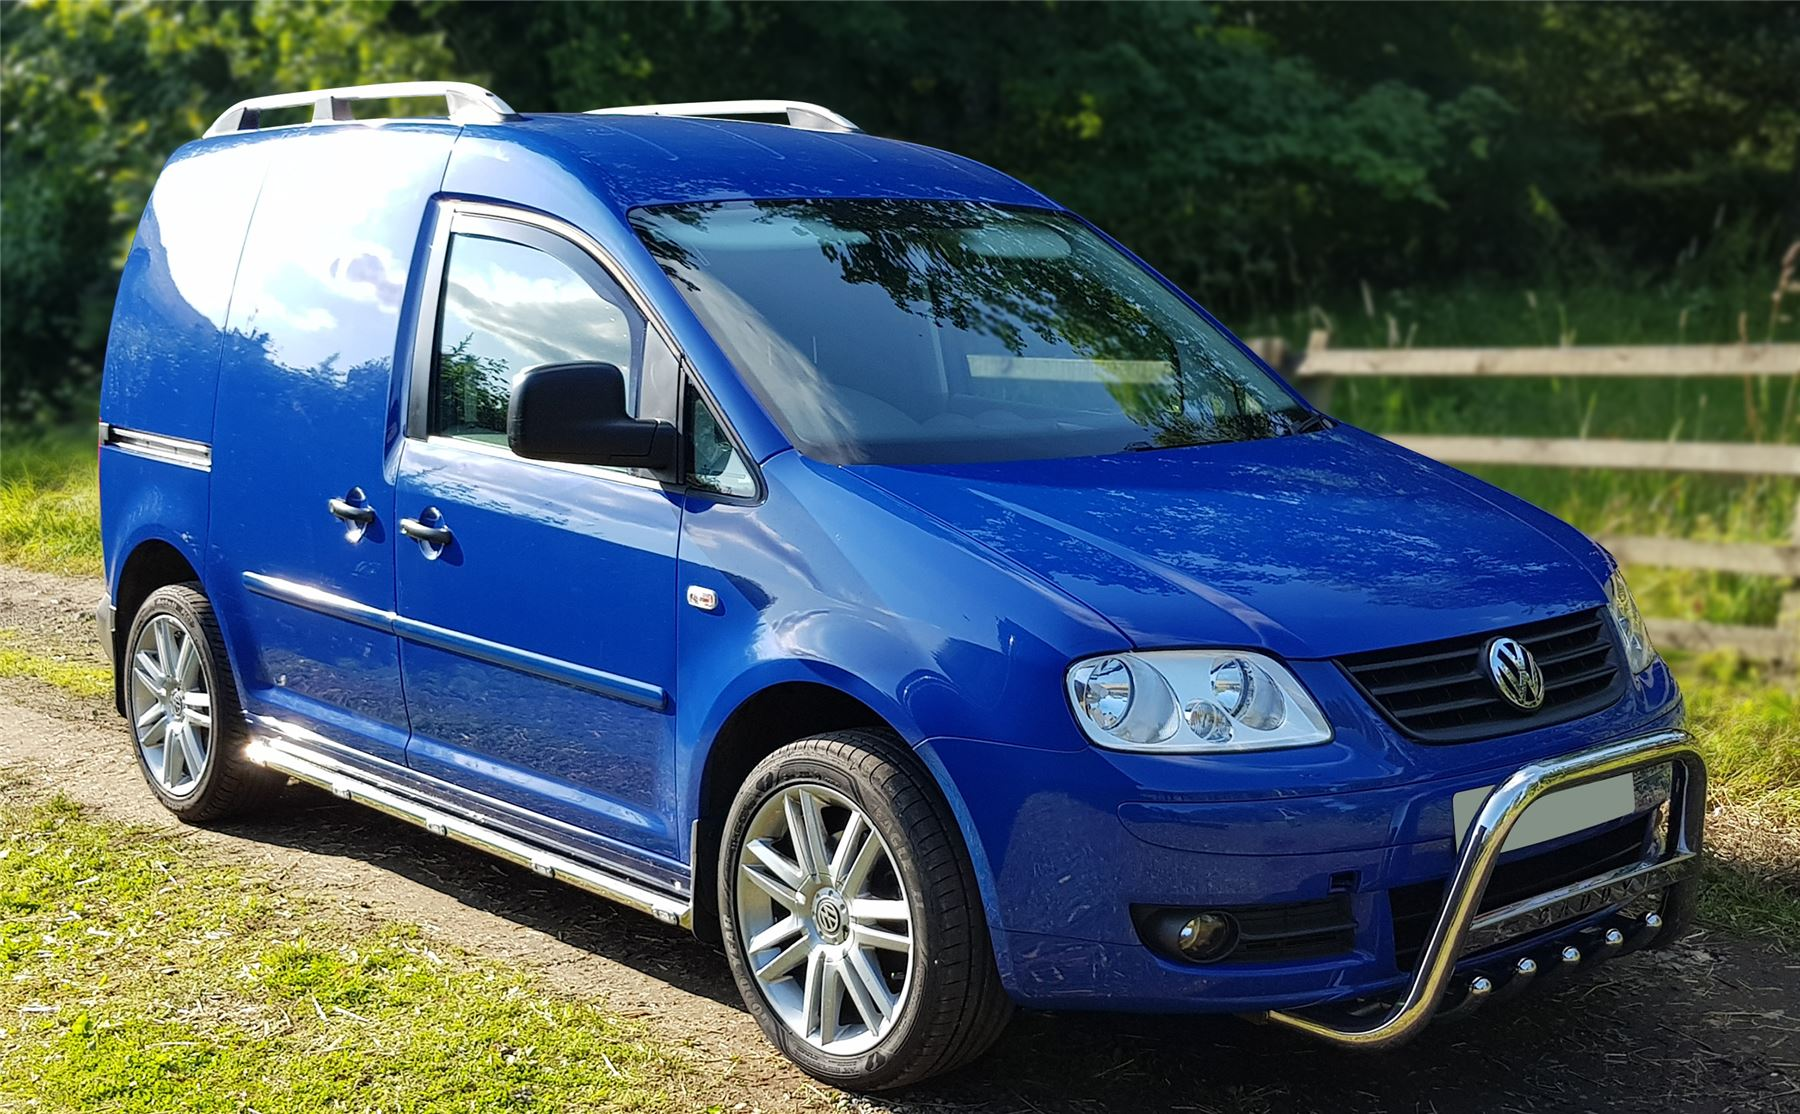 Spiksplinternieuw To Fit 2004 - 2010 VW Caddy Maxi Side Bars Steps Running Boards + EP-97